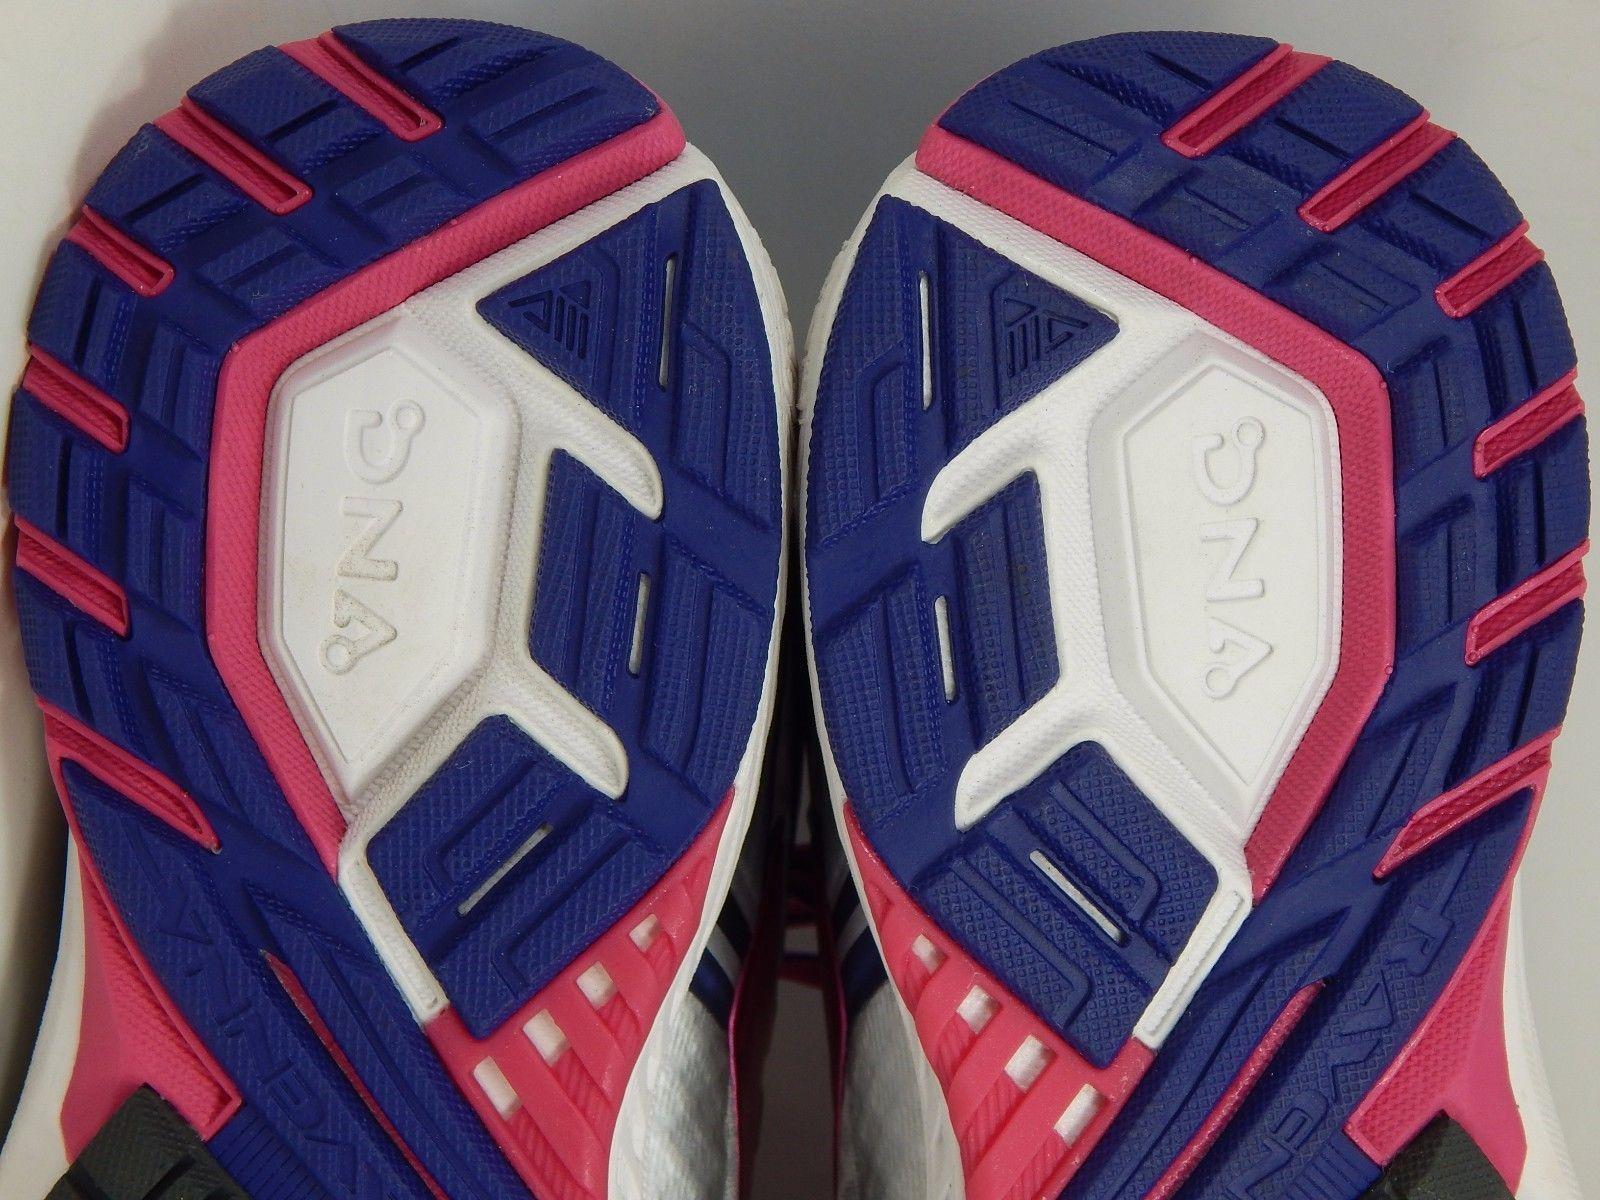 Brooks Ravenna 8 Women's Running Shoes Sz: US 9 M (B) EU 40.5 Silver 1202381B089